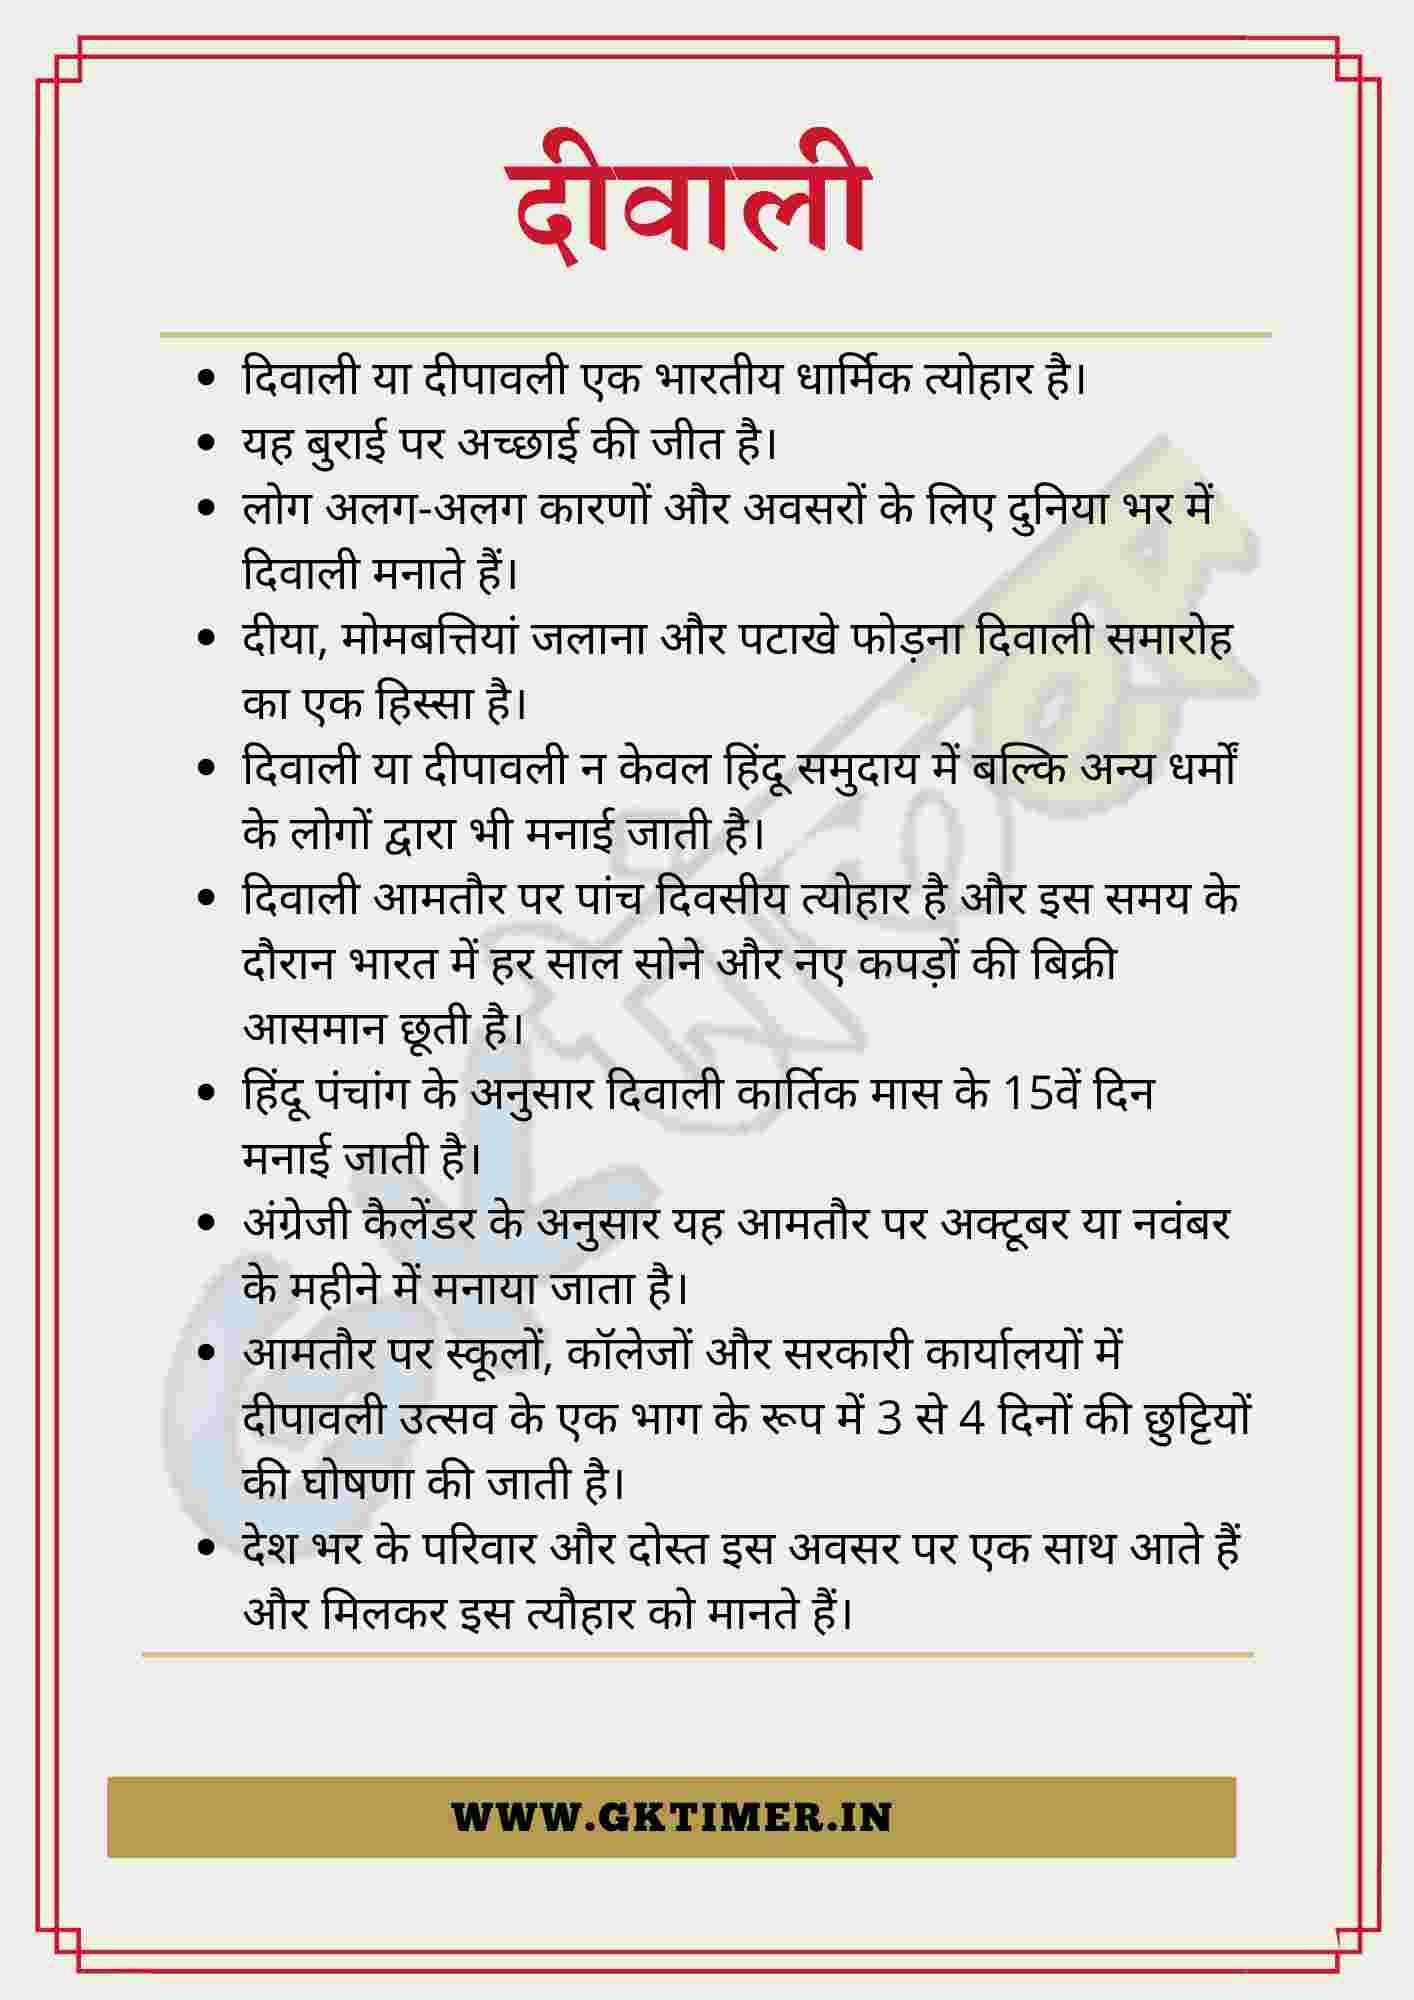 दीवाली पर निबंध | Diwali Essay in Hindi | 10 Lines on Diwali in Hindi